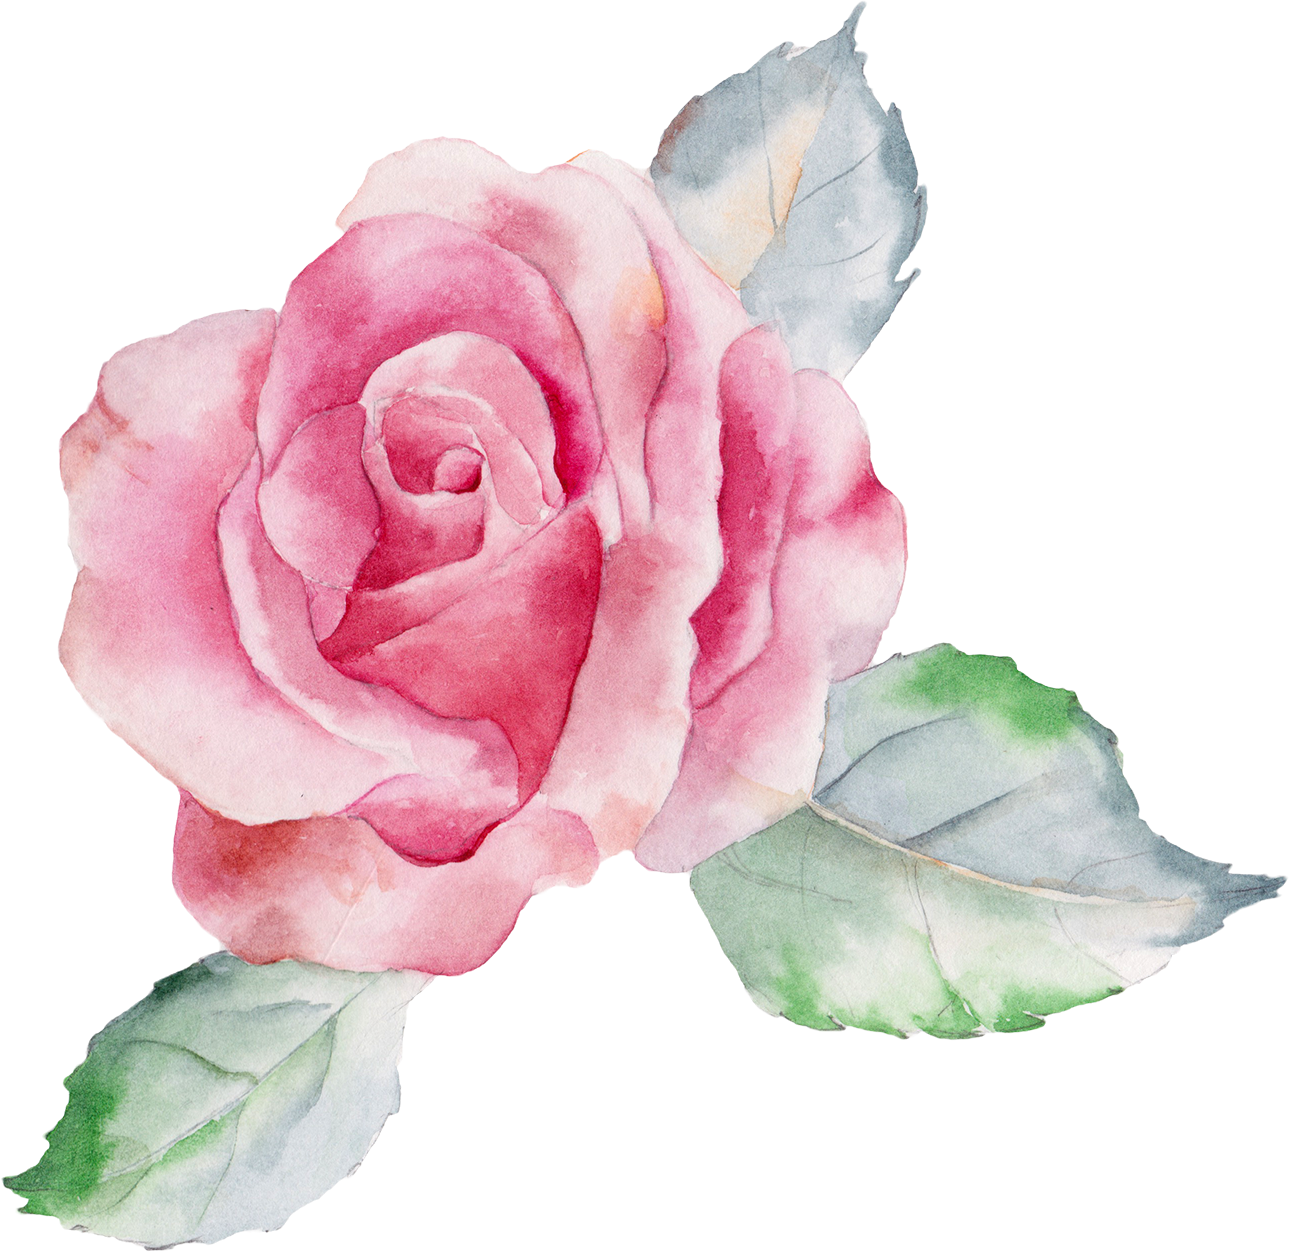 Роза рисунок акварелью на белом фоне